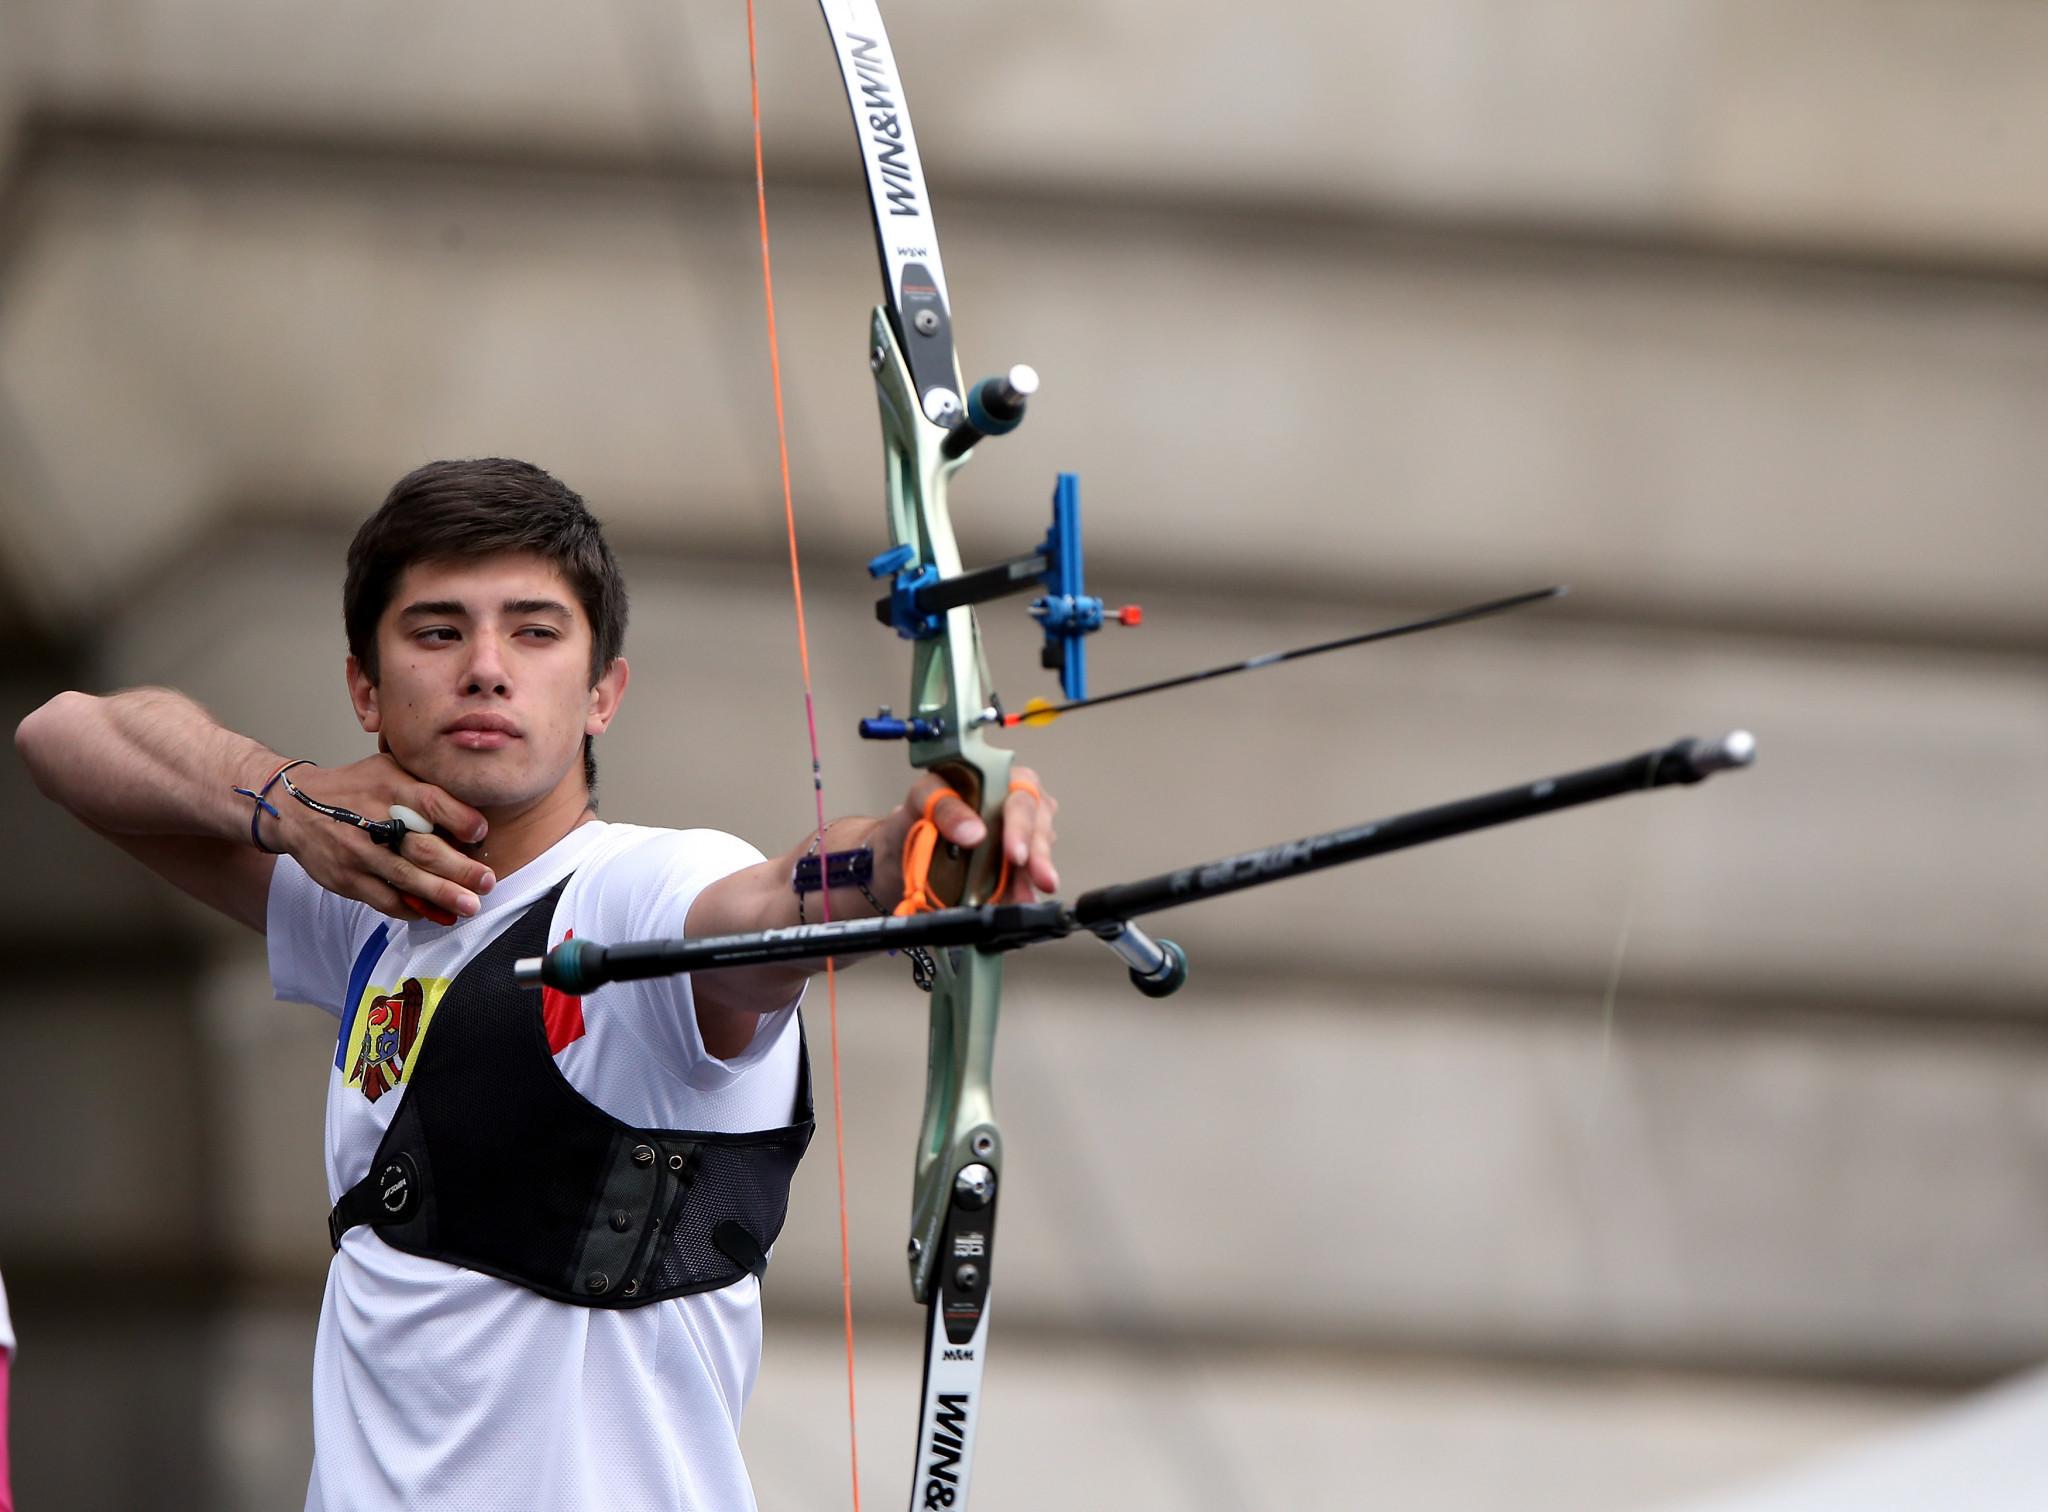 Olaru beats defending champion Valladont to reach men's recurve final at European Archery Championships